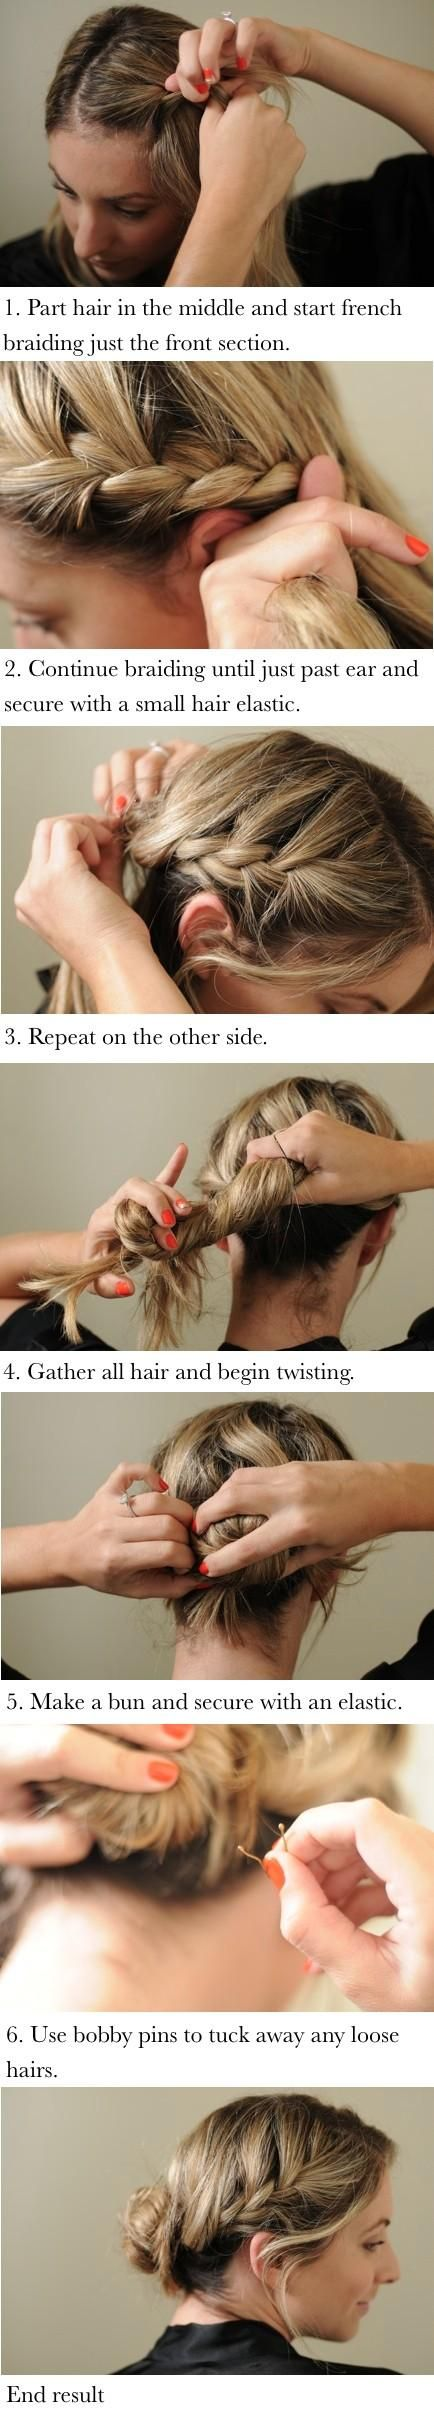 Braided bun how to: Braided Buns, Hairstyles, Hair Styles, Makeup